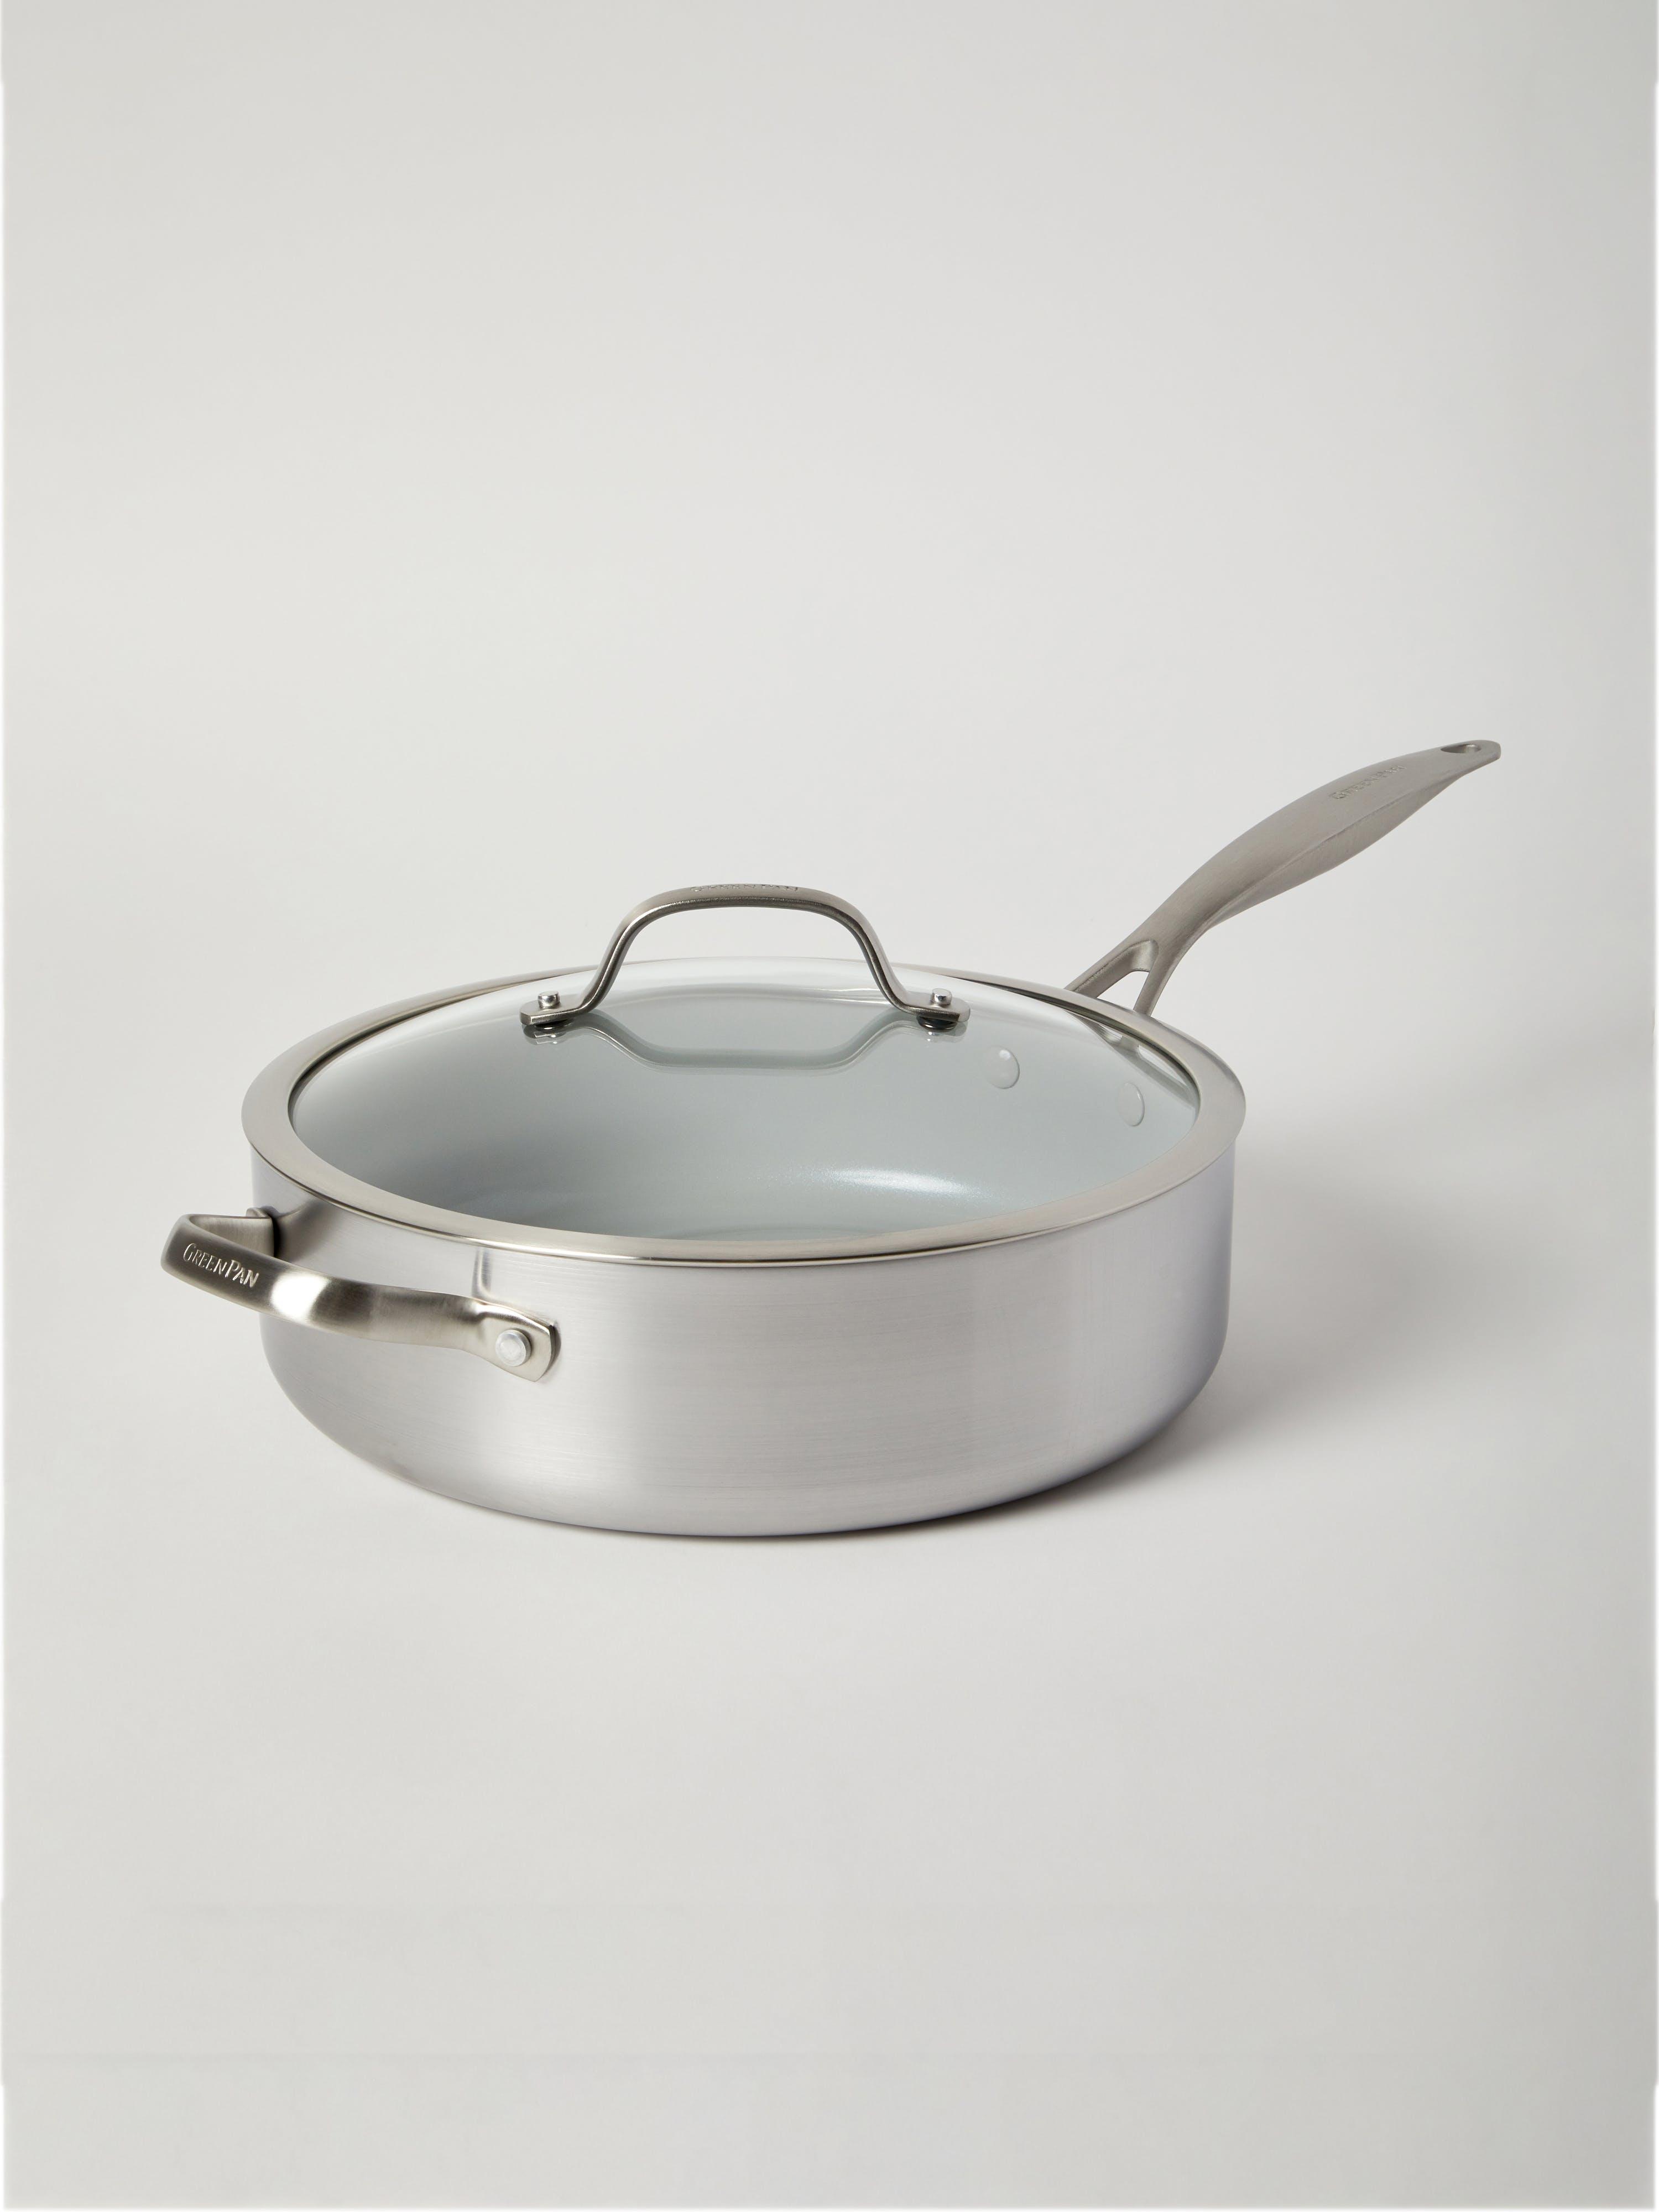 Greenpan Venice Pro 5-Quart Ceramic Non-Stick Sauté Pan  - Grey